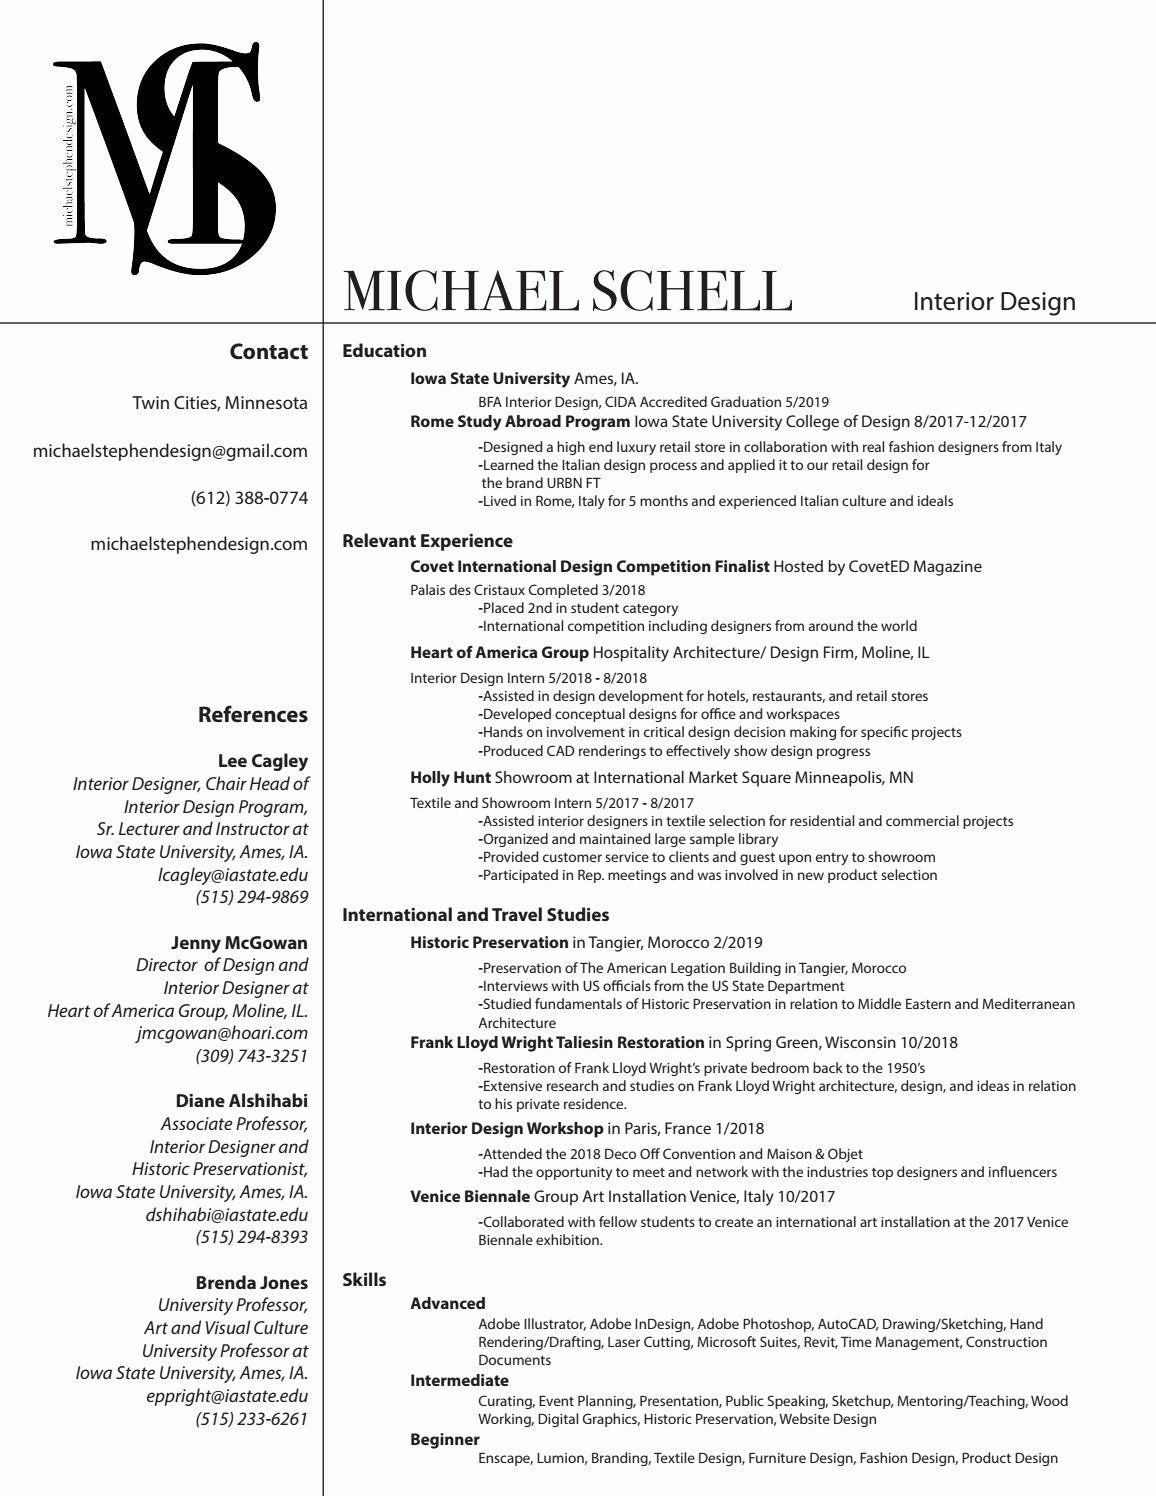 Resume Study Abroad Example Beautiful Resume By Michaelstephendesign Issuu Beautiful Issuu Michaelstephendesign Resume S Study Abroad College Design Resume